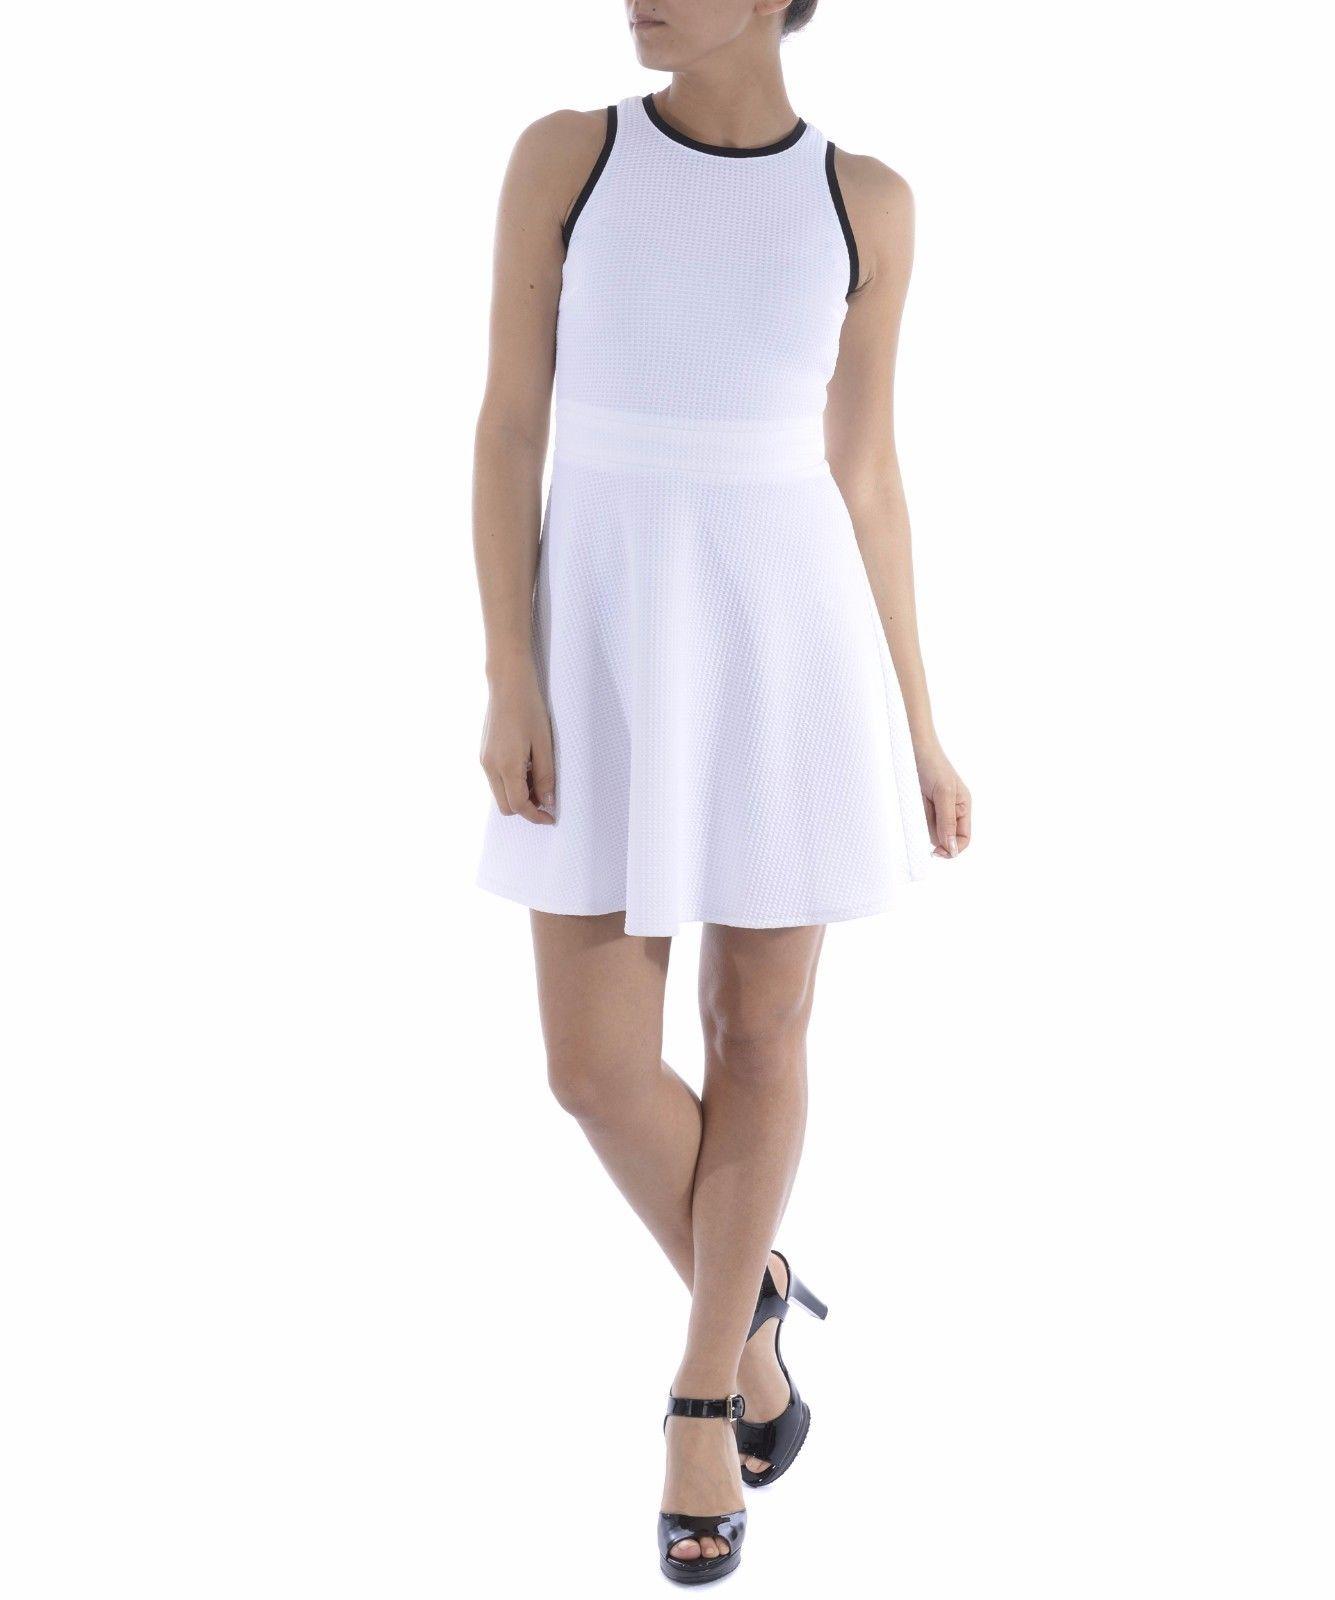 246ab0d75b Pinko White Women Dress Tiziano Abito ZZ1 Bianco Nero on Storenvy